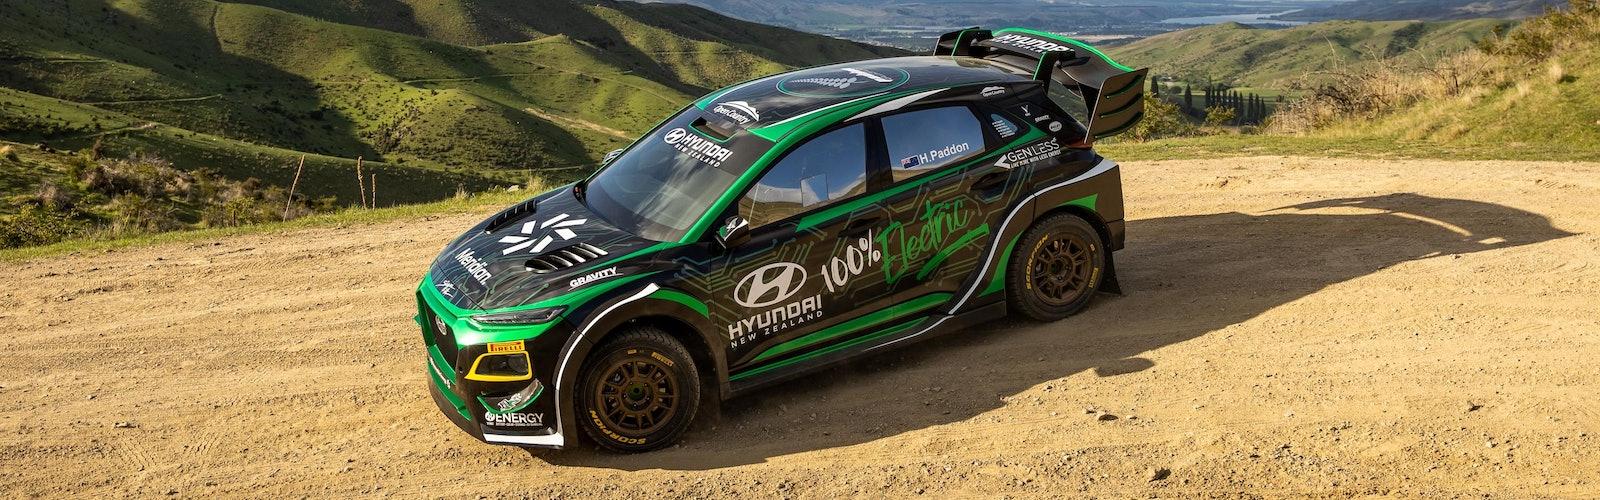 Hyundai EV rally car _static2 by Graeme Murray Photography